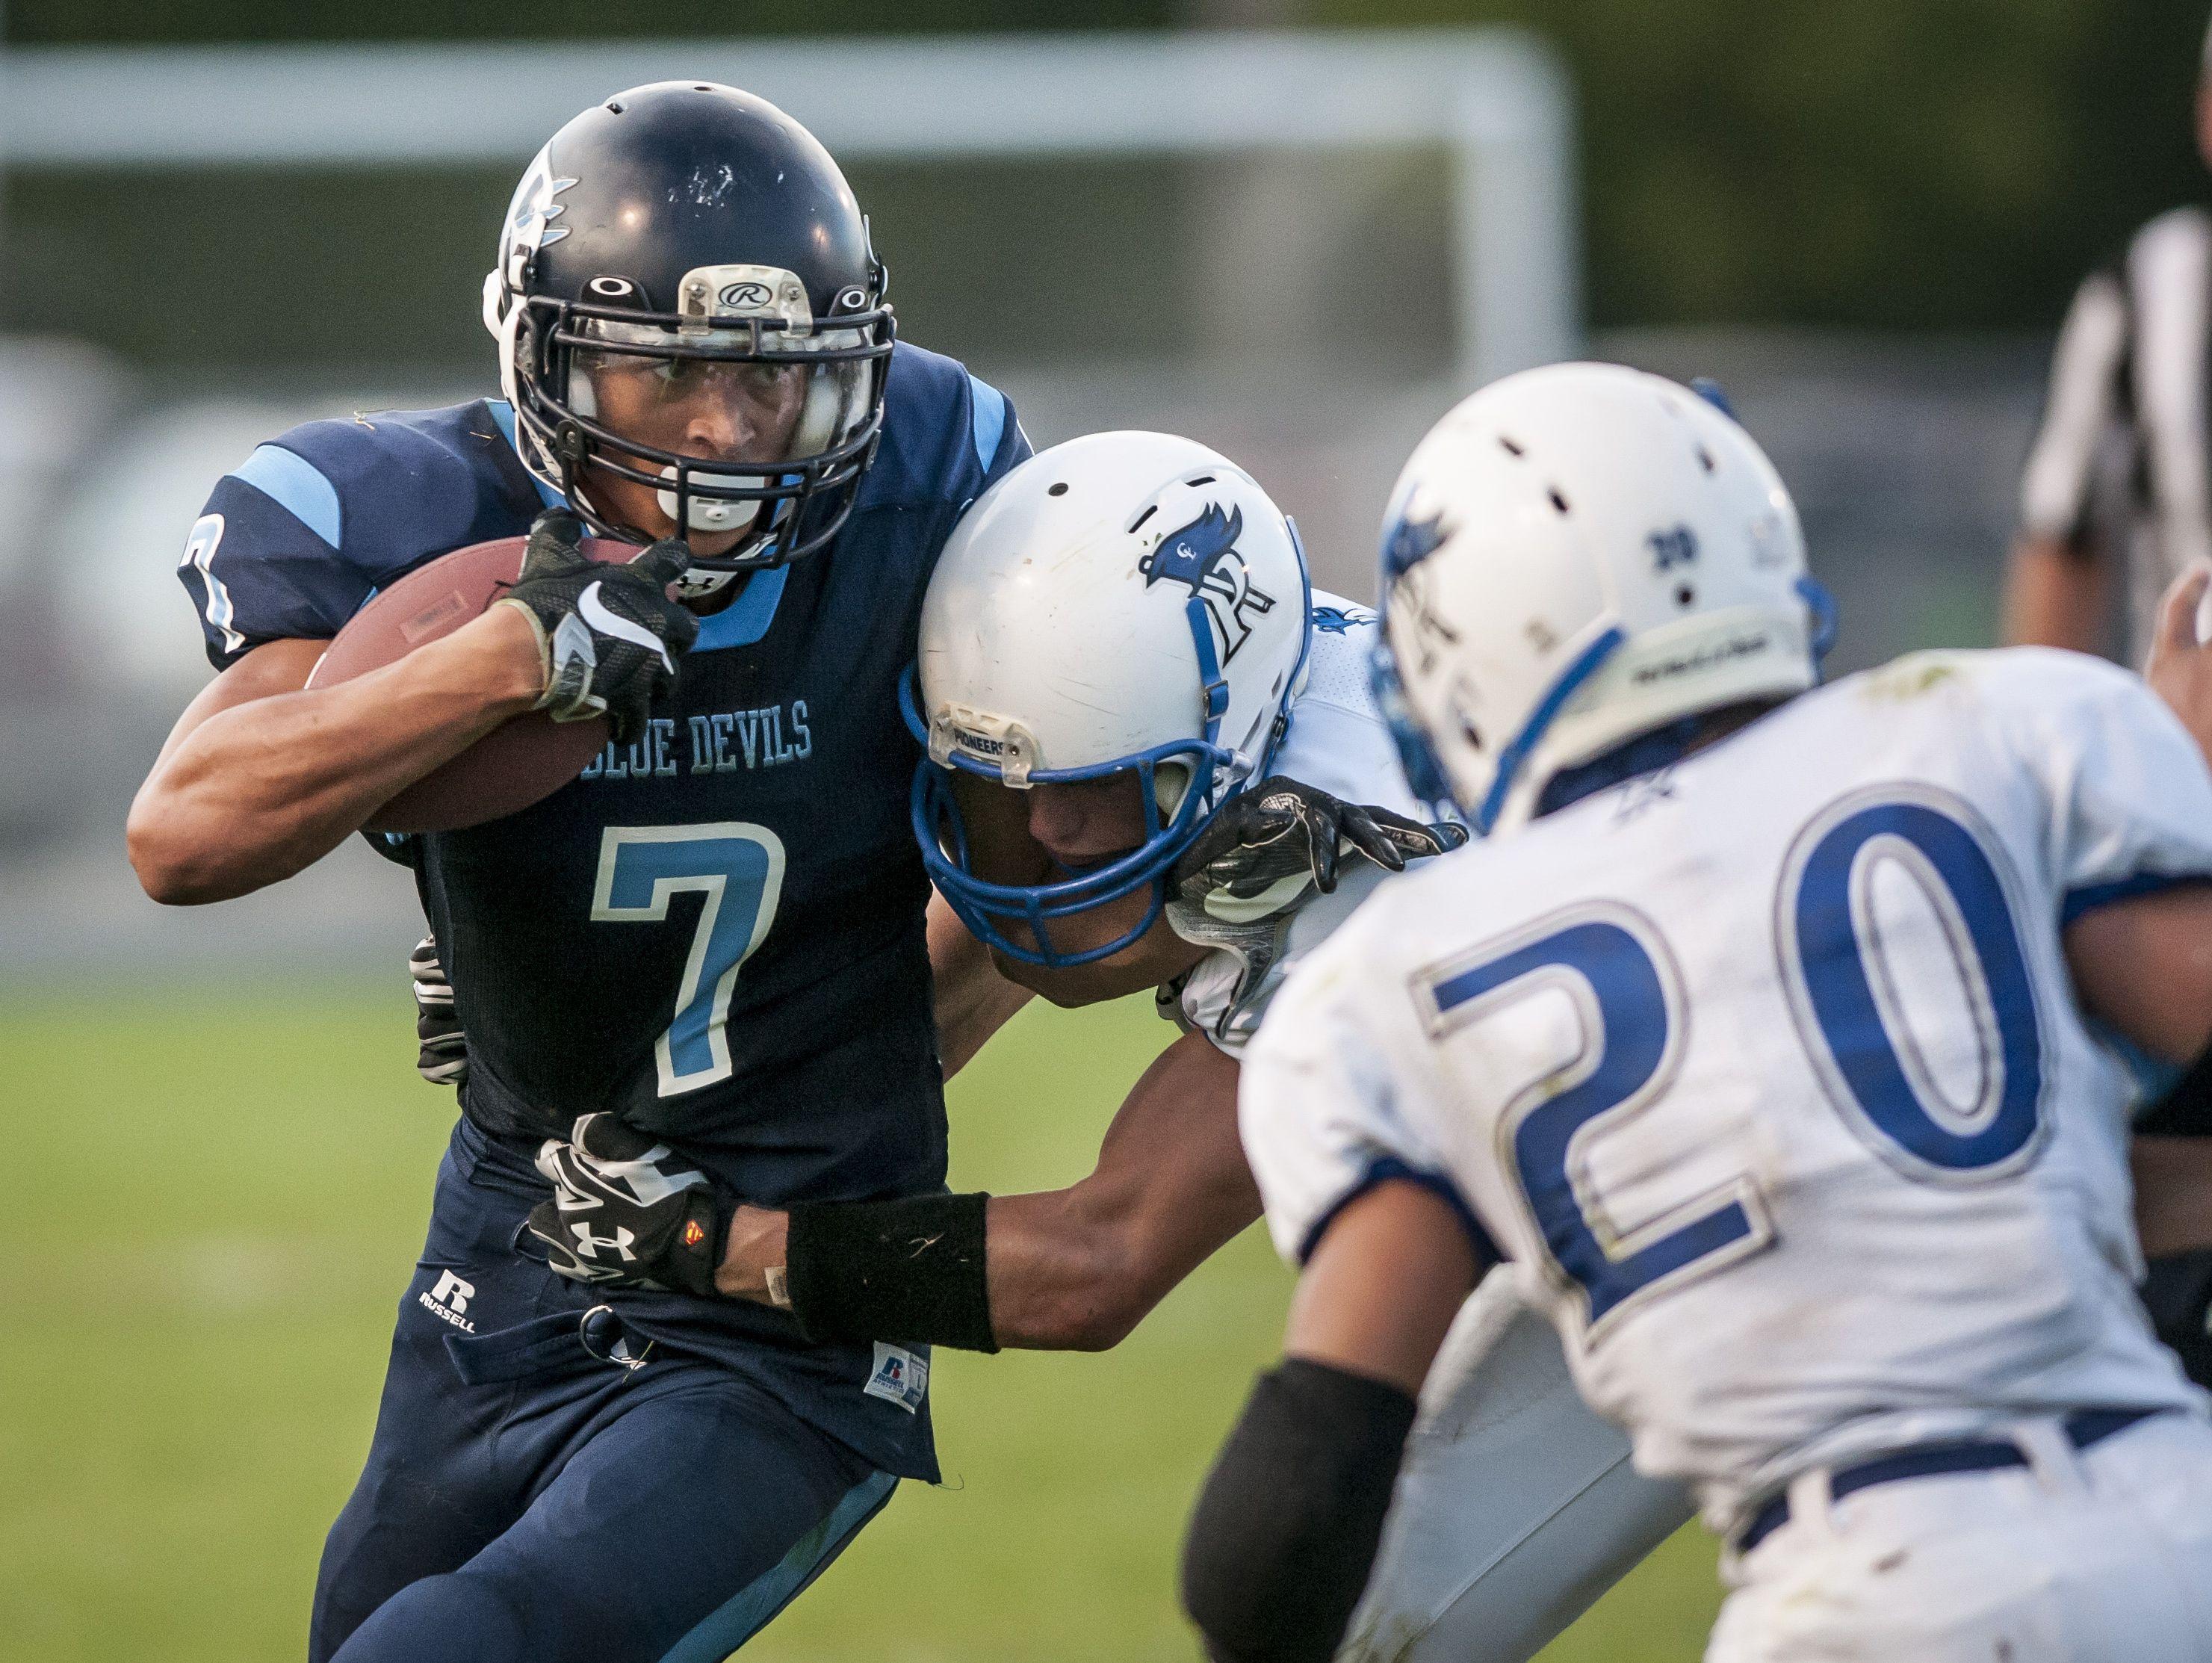 Richmond's D'Sean Hamilton runs the ball during a football game Friday, September 9, 2016 at Richmond High School.